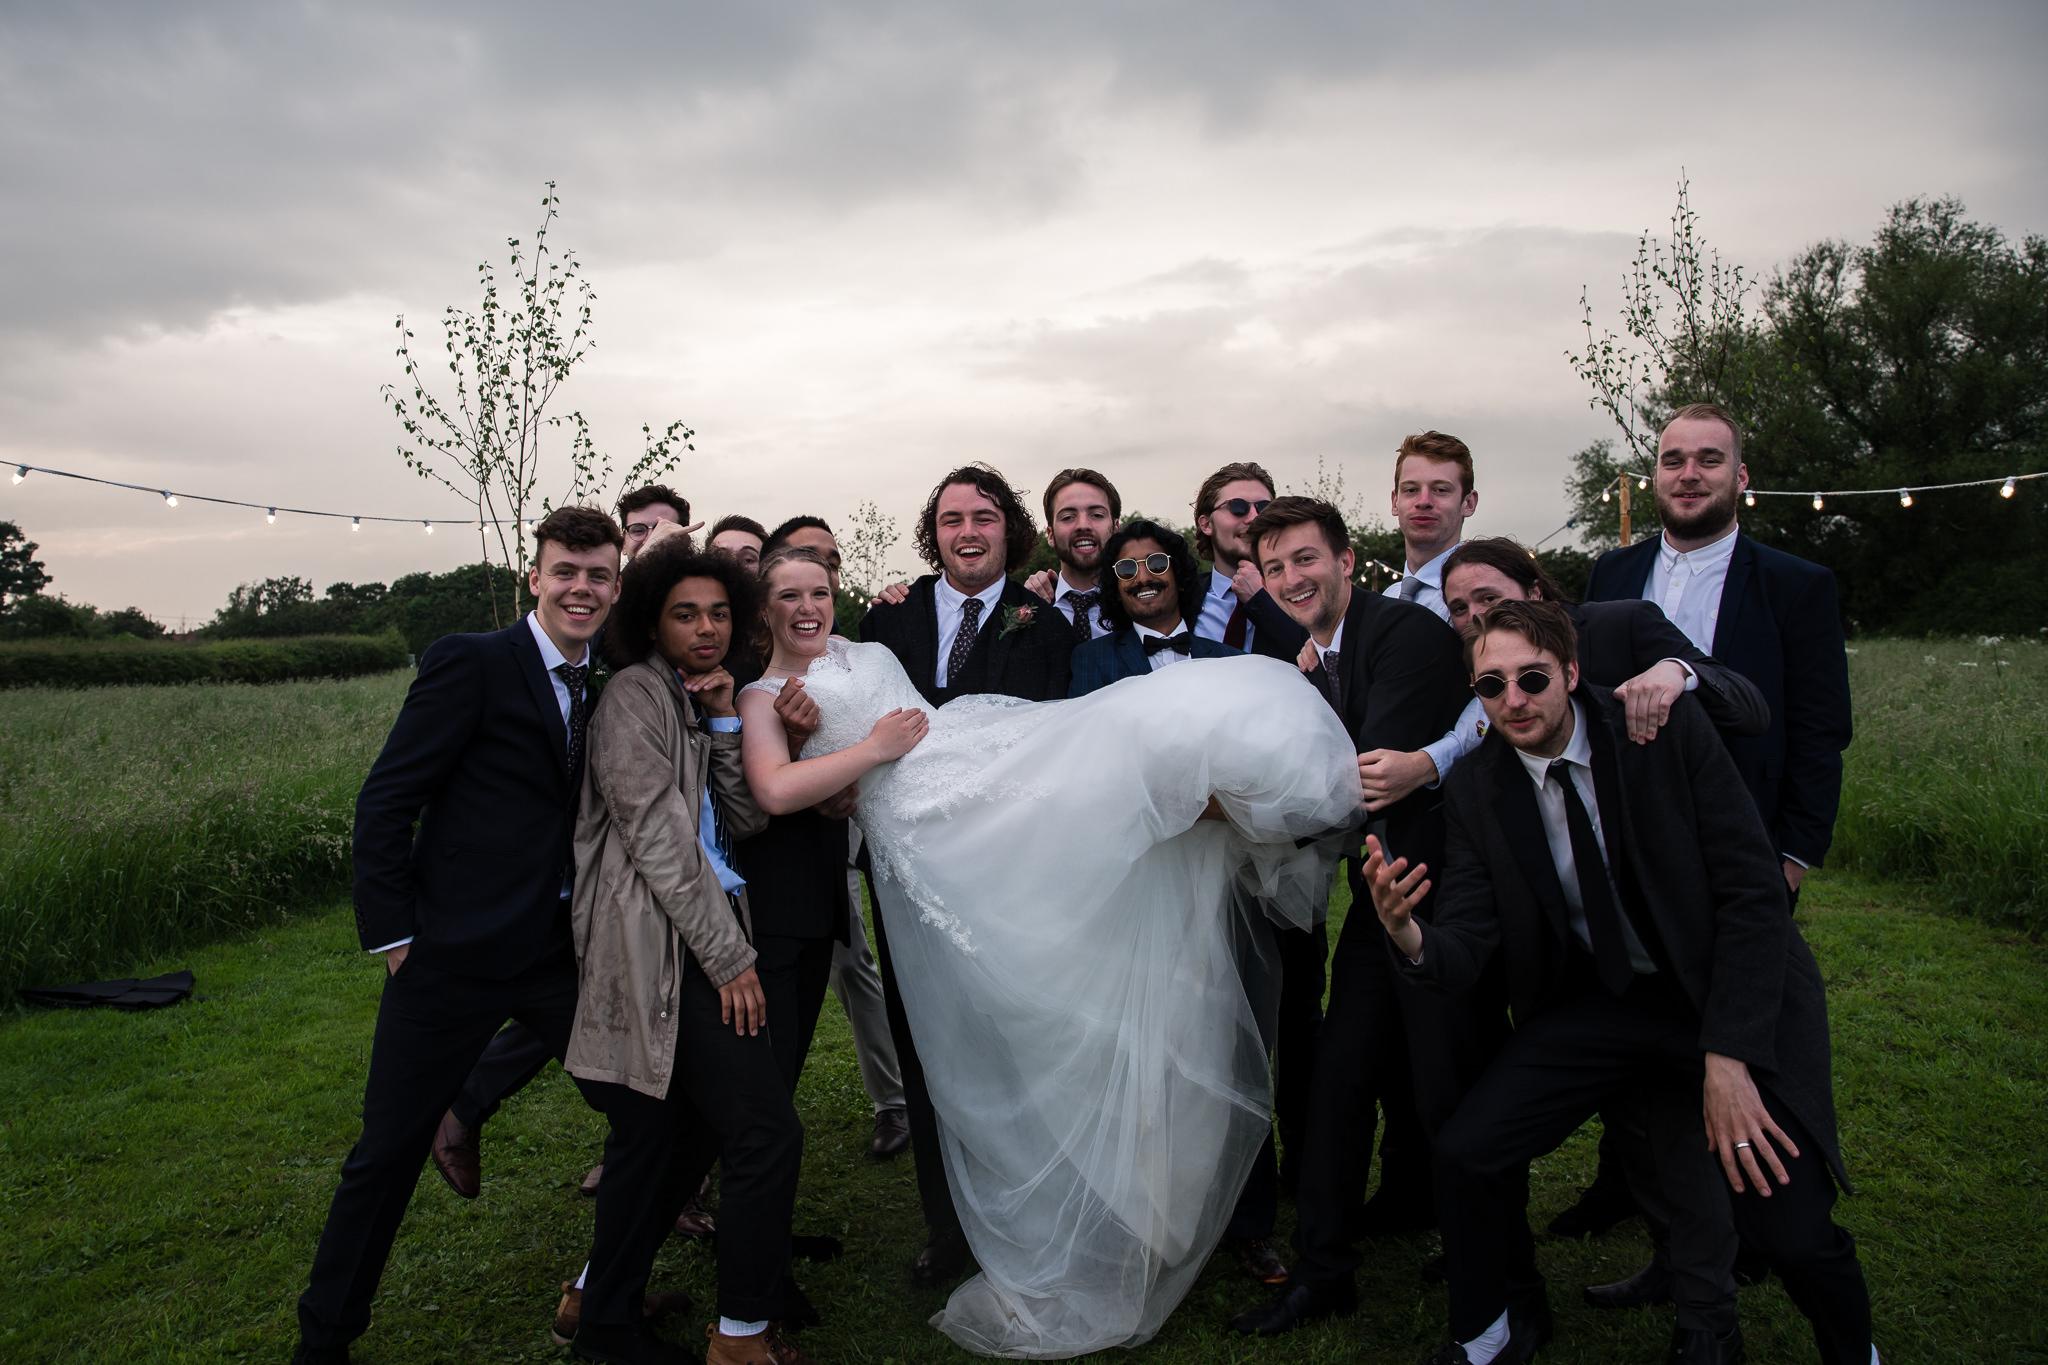 nottingham wedding69